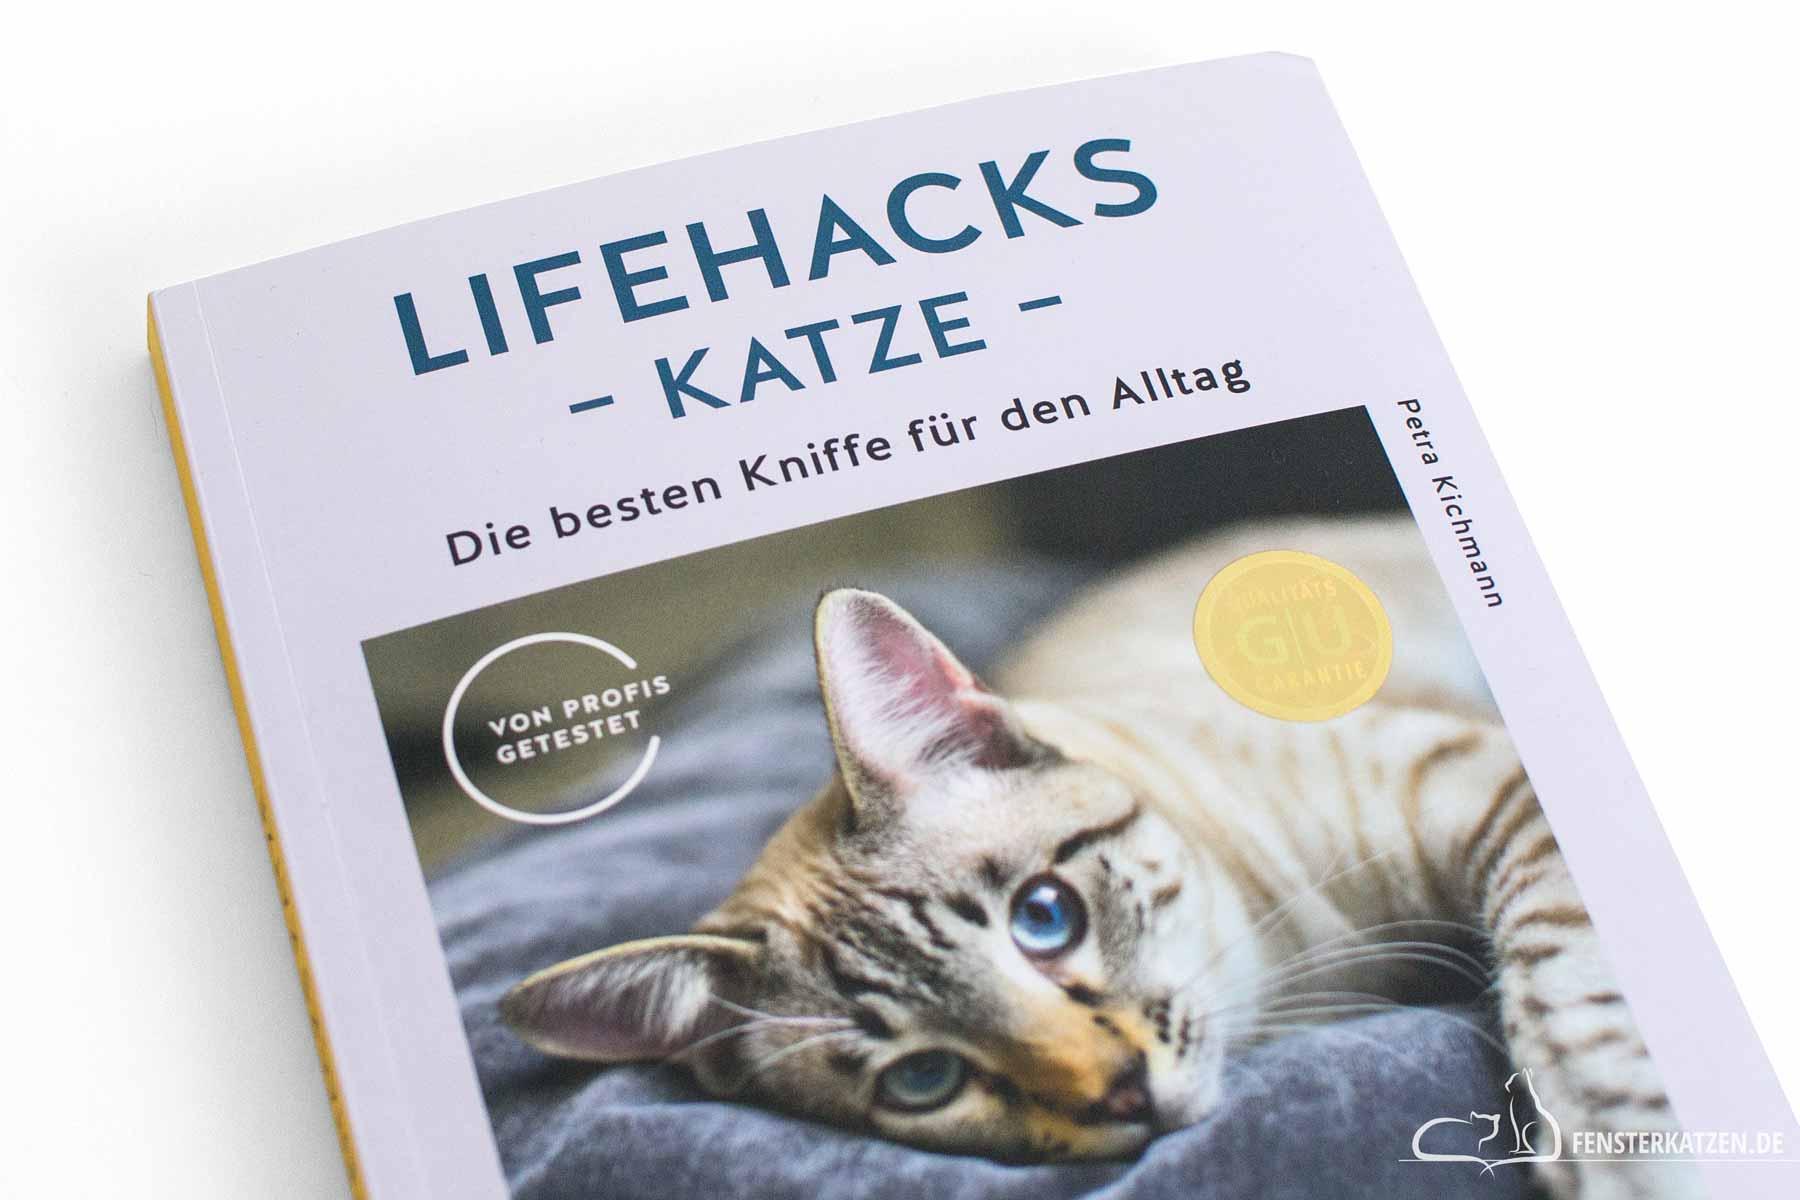 Fensterkatzen-Do-It-Yourself-Buch-Lifehacks-Katze-Grossstadtkatze-Titelbild